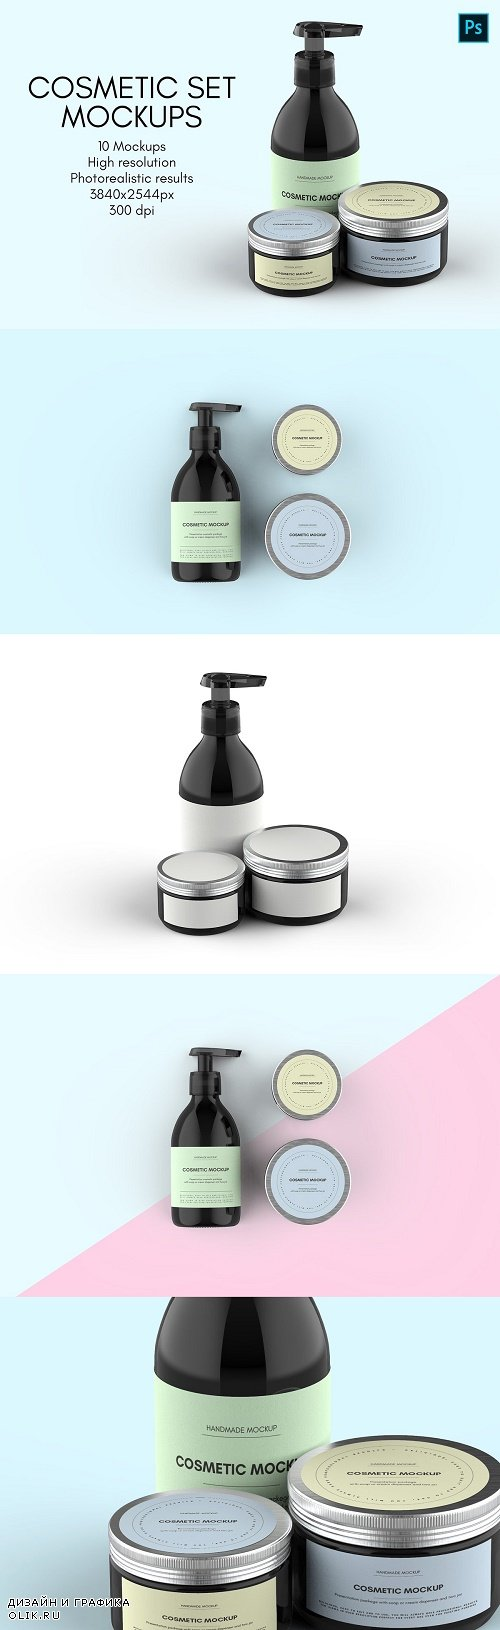 Cosmetic Set Mockups - 10 views - 4574478